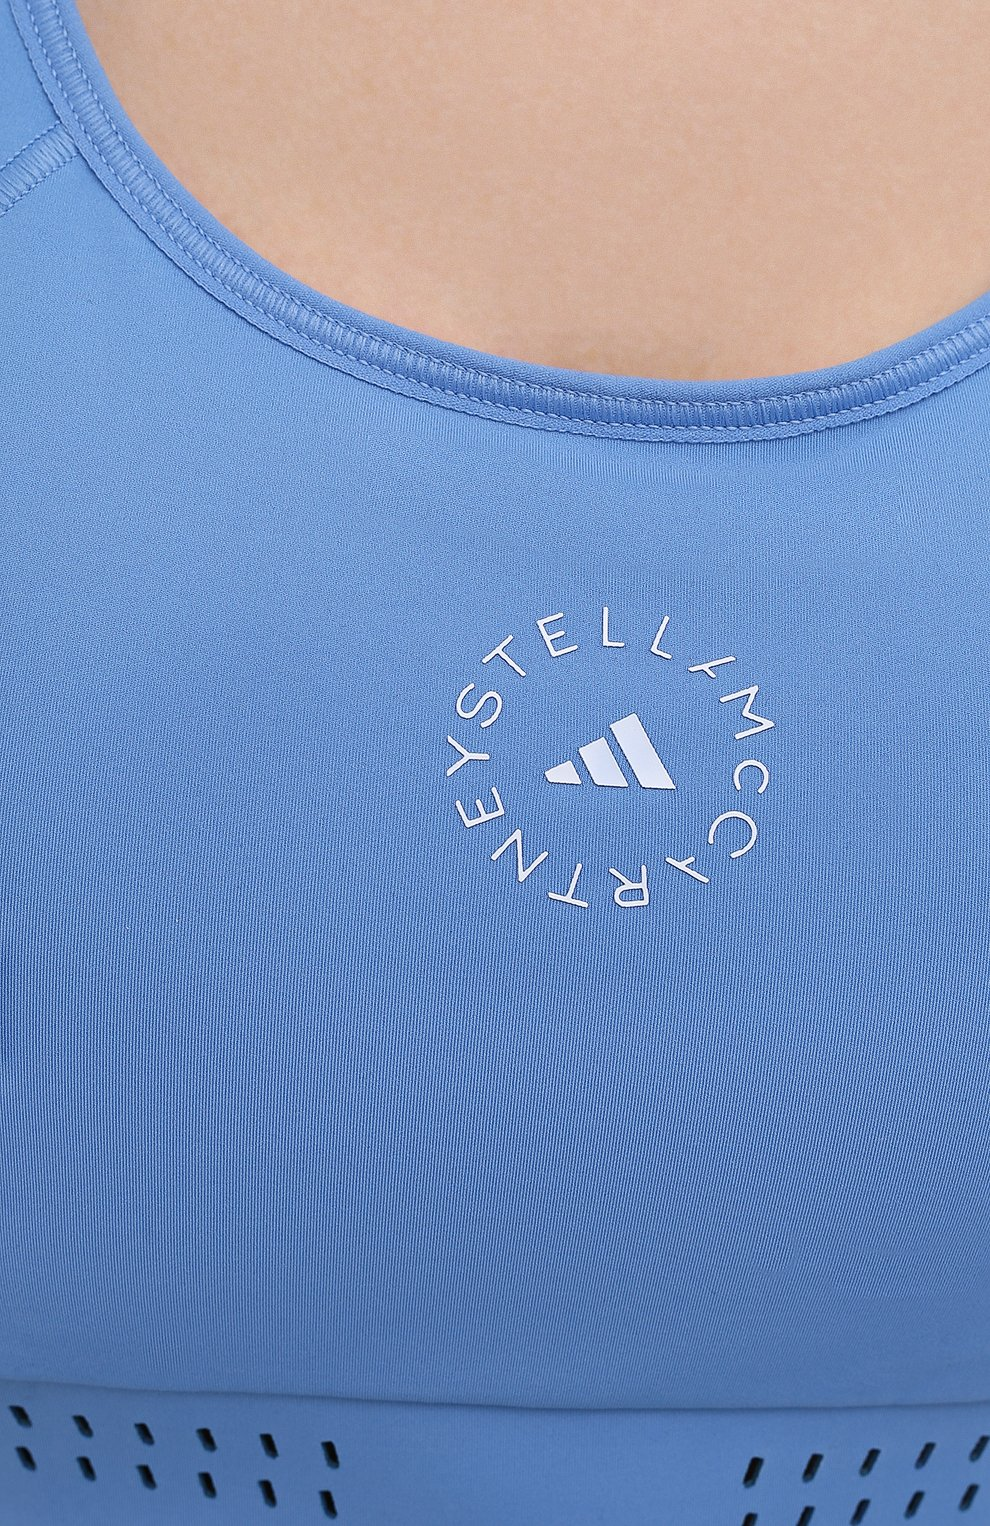 Женский бра-топ ADIDAS BY STELLA MCCARTNEY голубого цвета, арт. GQ1214 | Фото 5